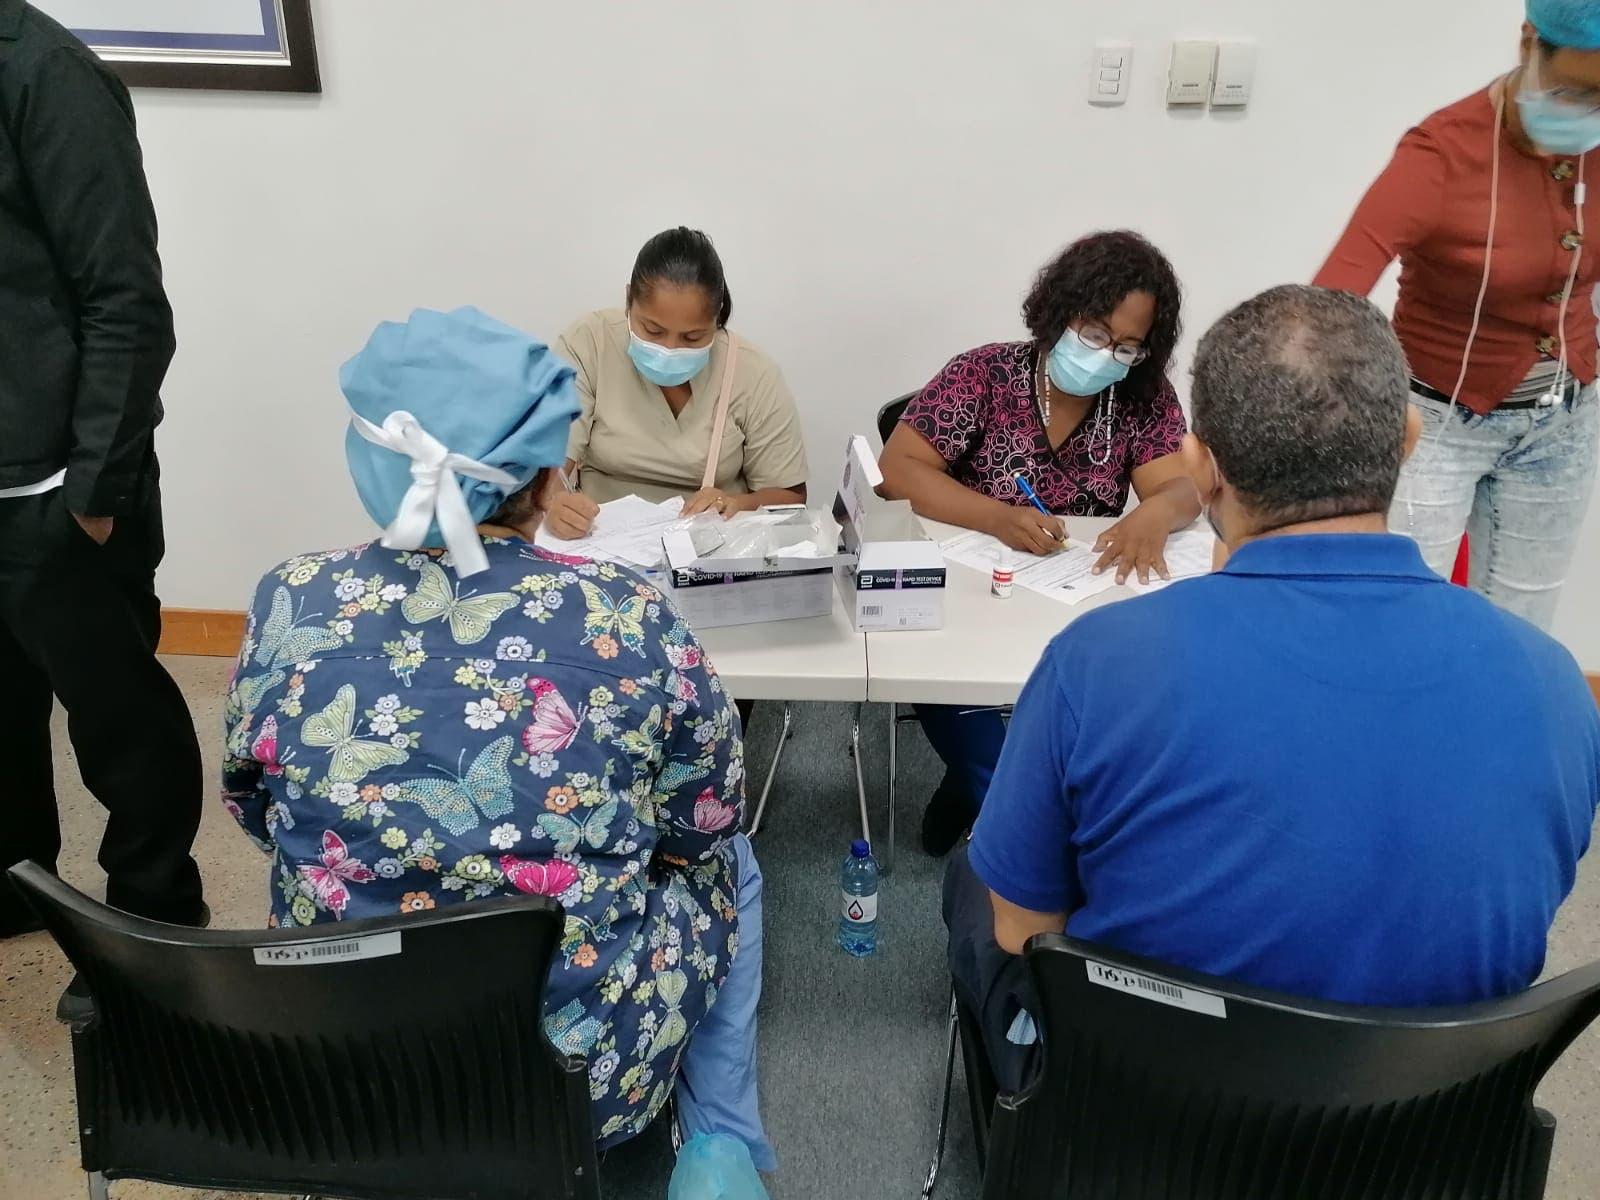 Instituto Dermatológico se suma a jornada pruebas de antígenos